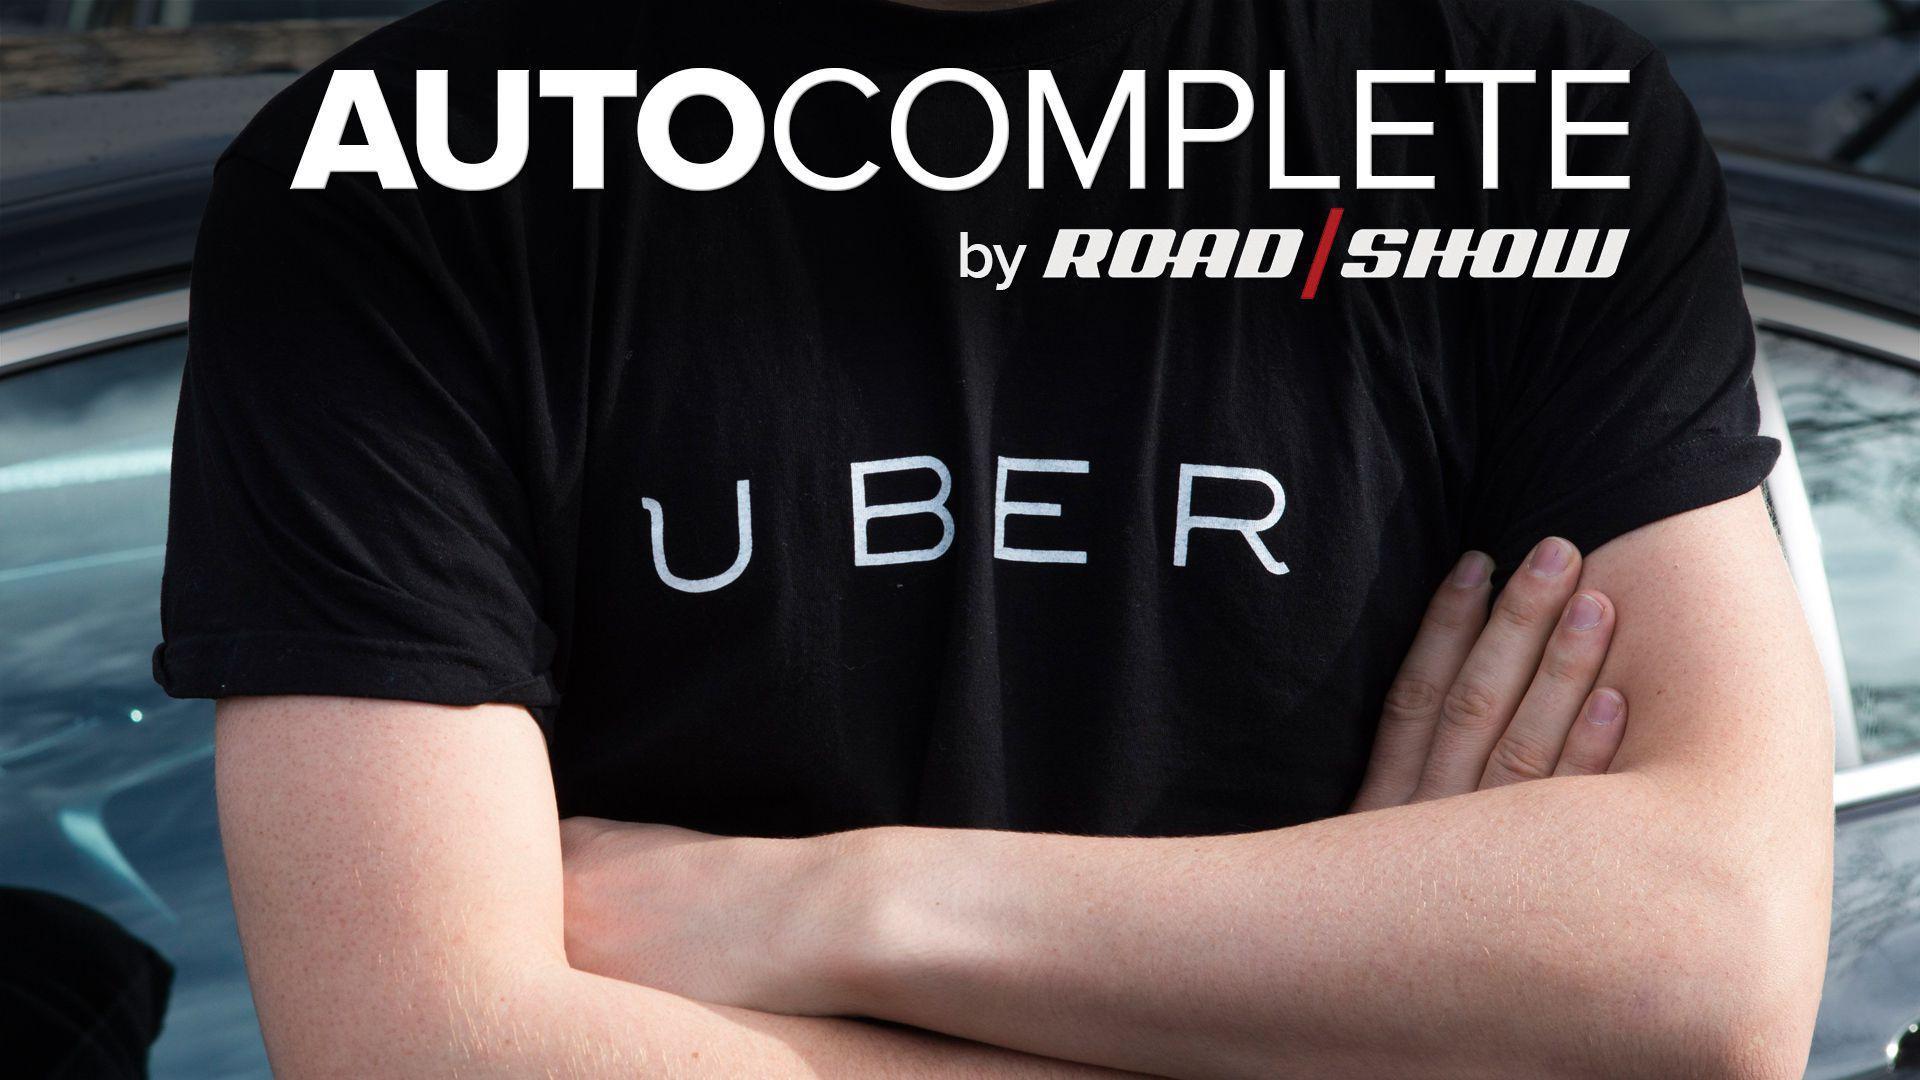 AutoComplete: Google's Waymo accuses Uber of industrial espionage